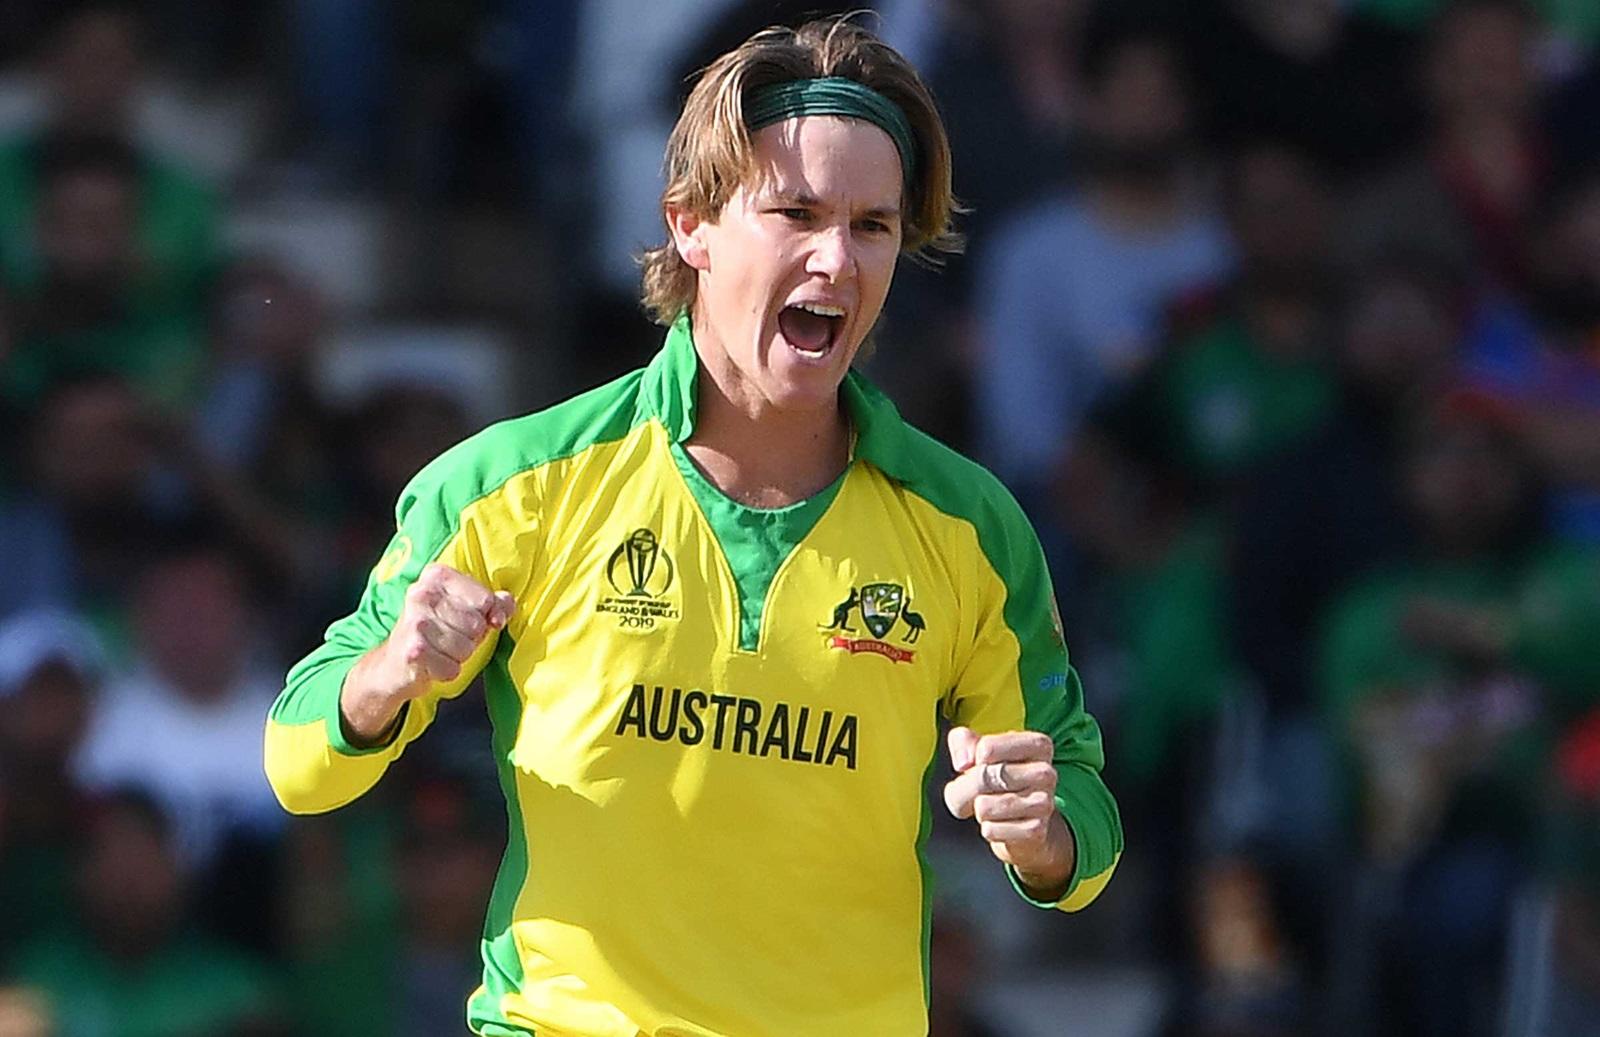 Zampa sticks with Plan A ahead of summer opener | cricket.com.au